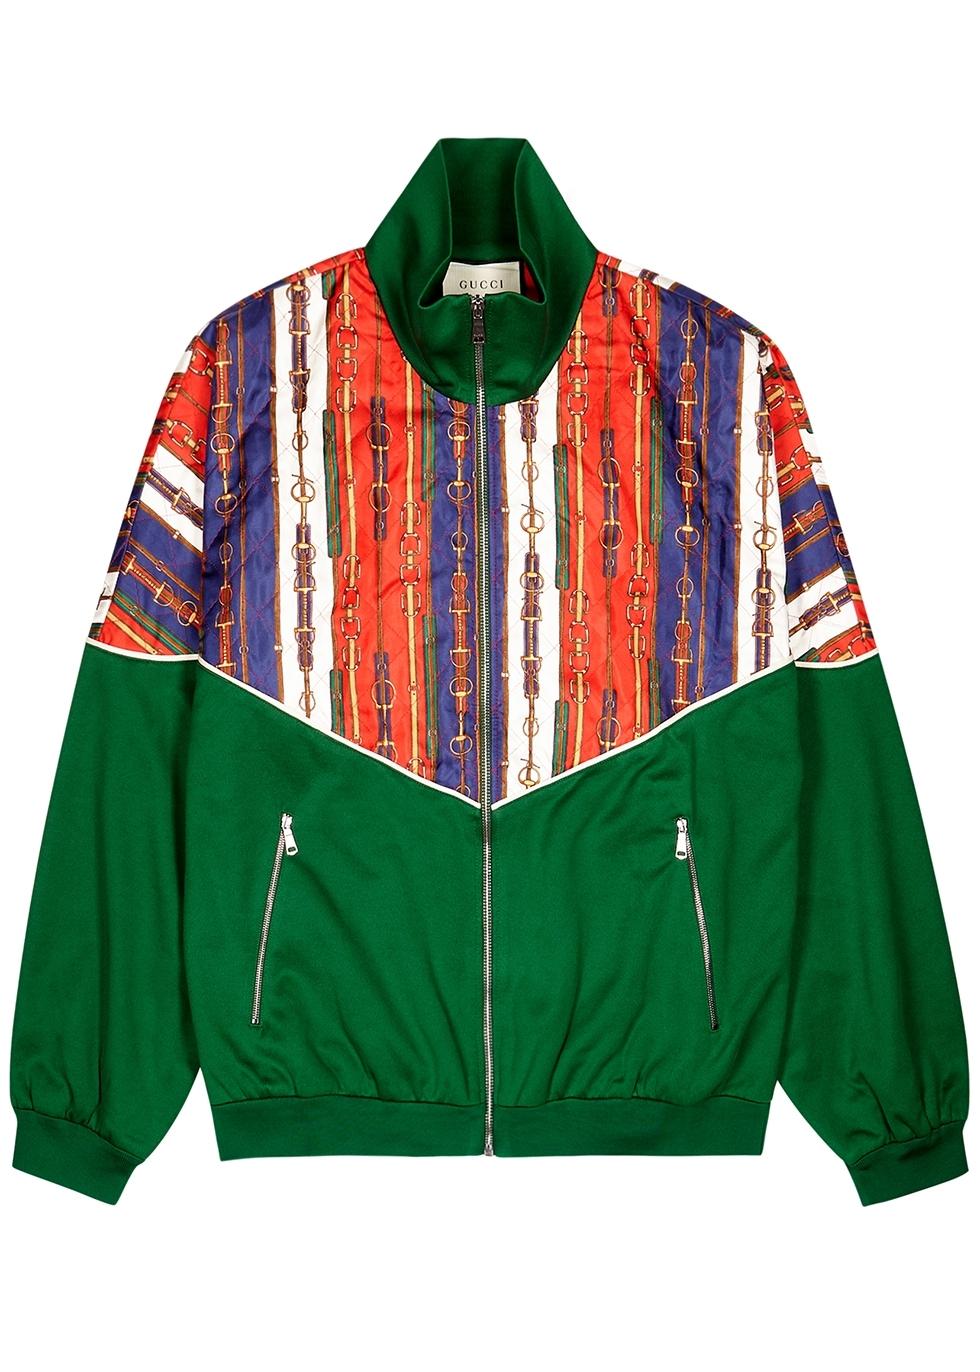 99d53edb8 Men s Designer Clothing